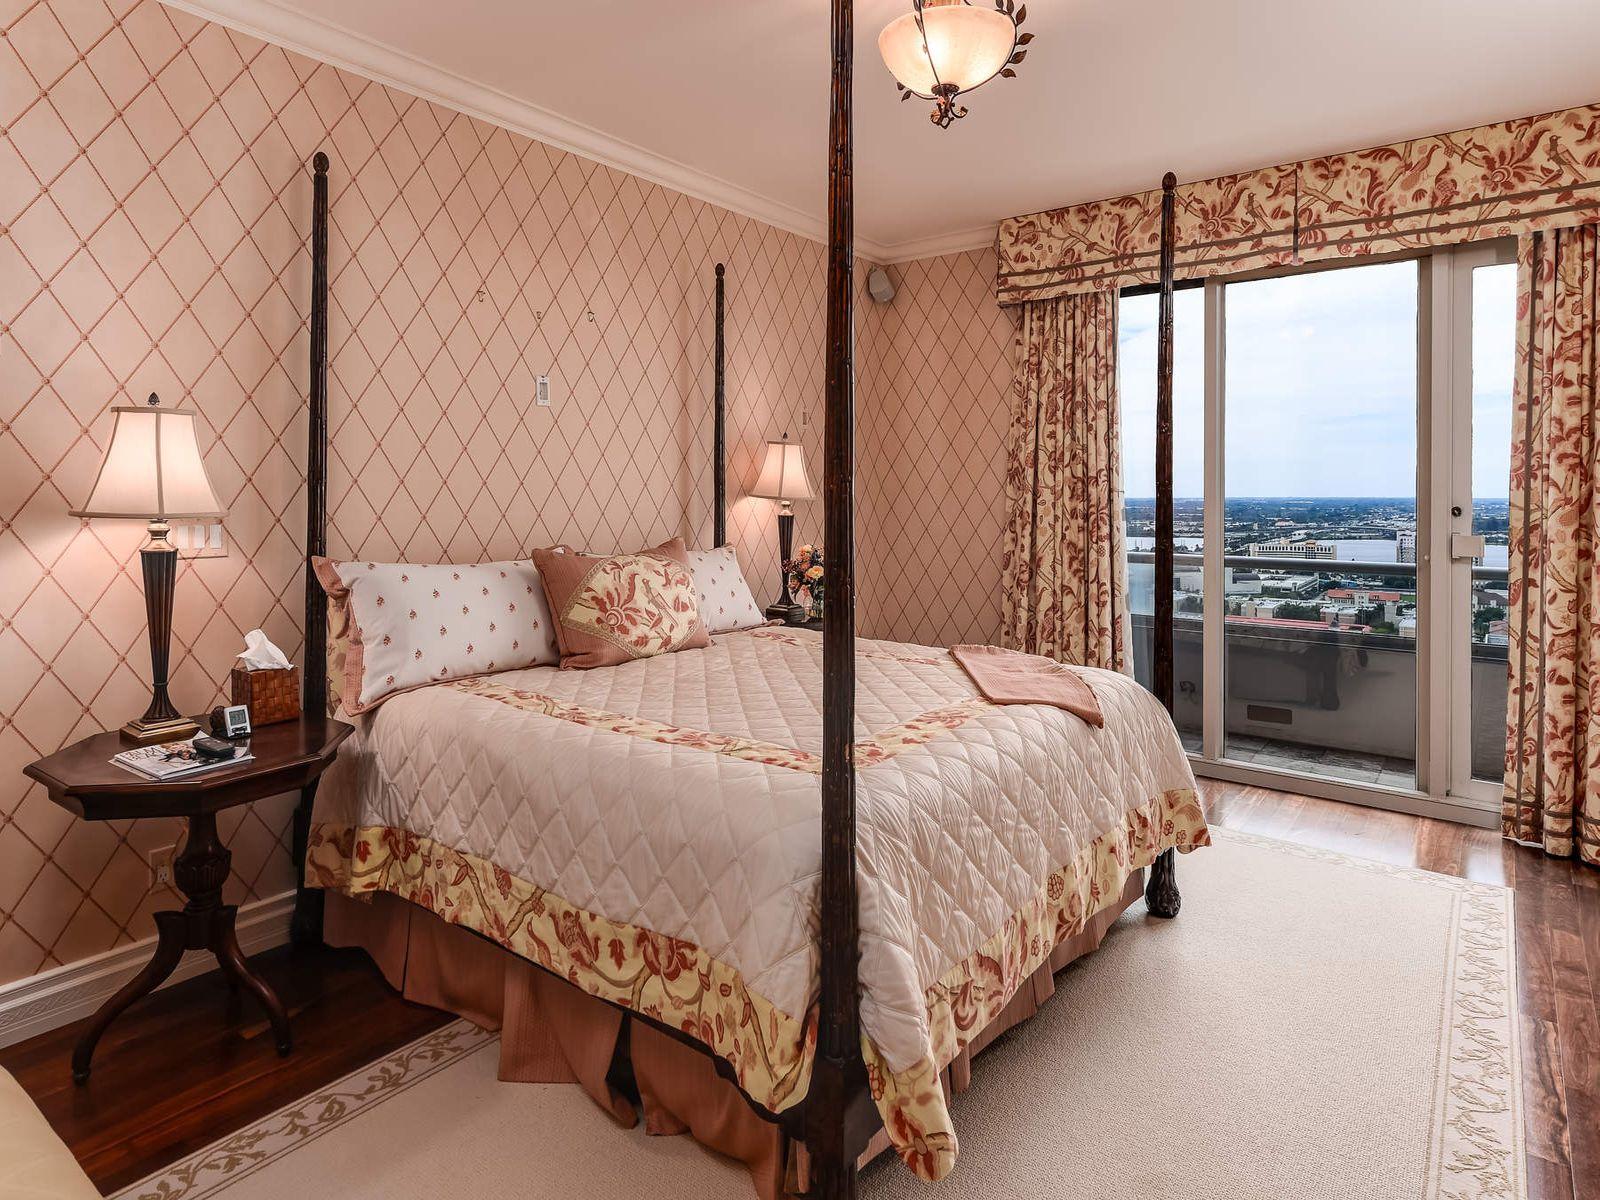 Trump Plaza Penthouse - Sotheby's International Realty